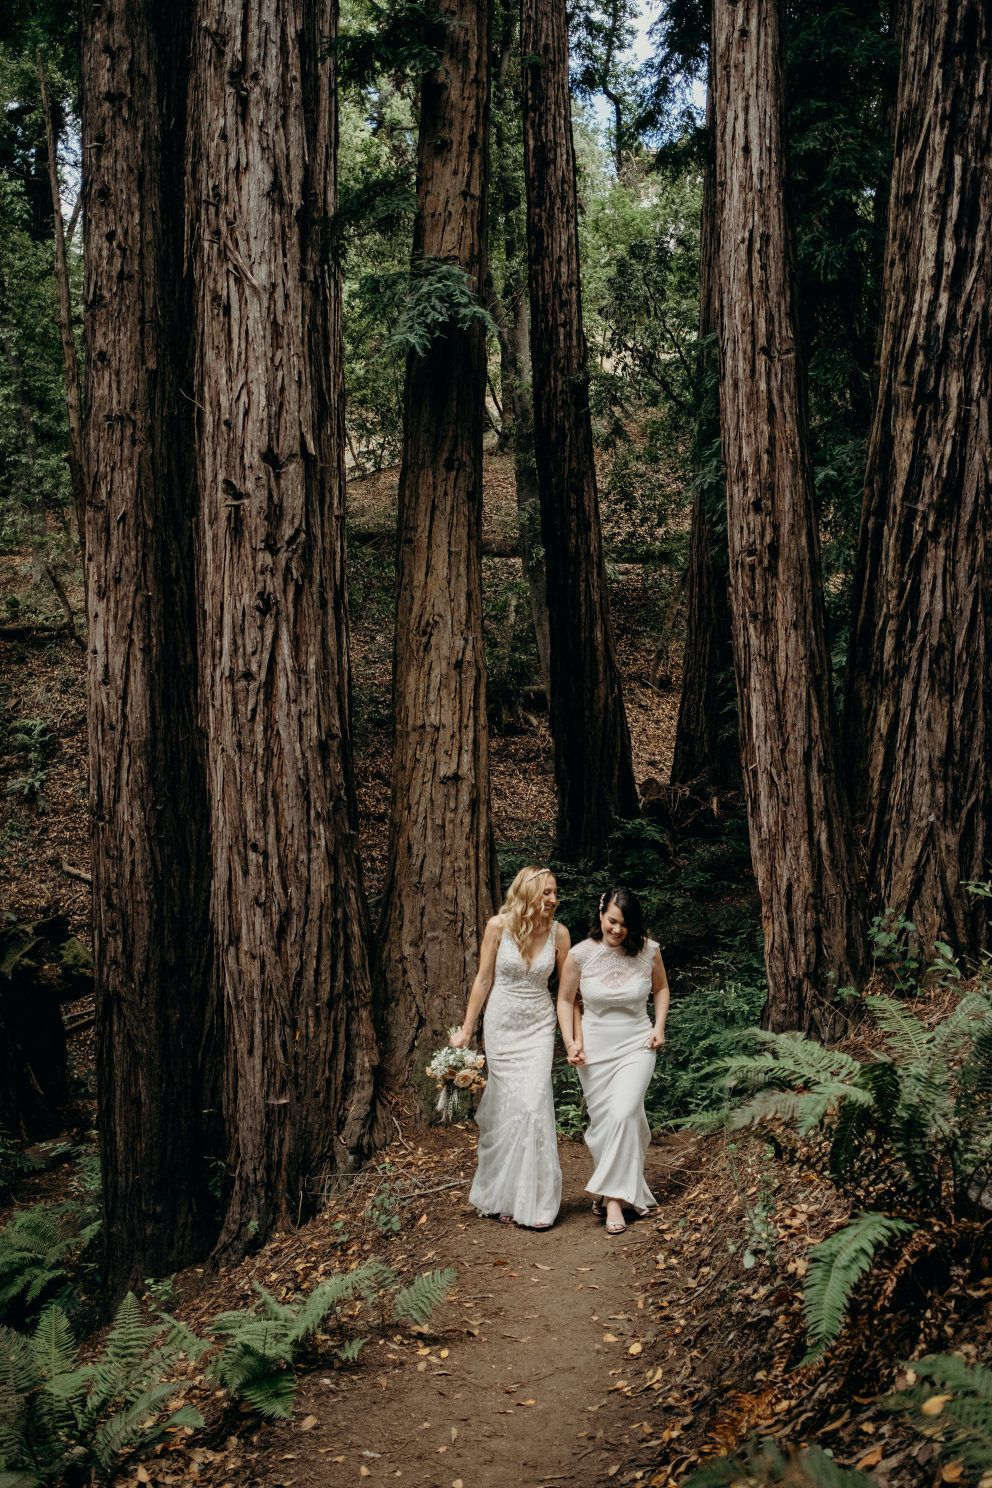 Best Redwood Forest Wedding Venues in California | Redwood ...